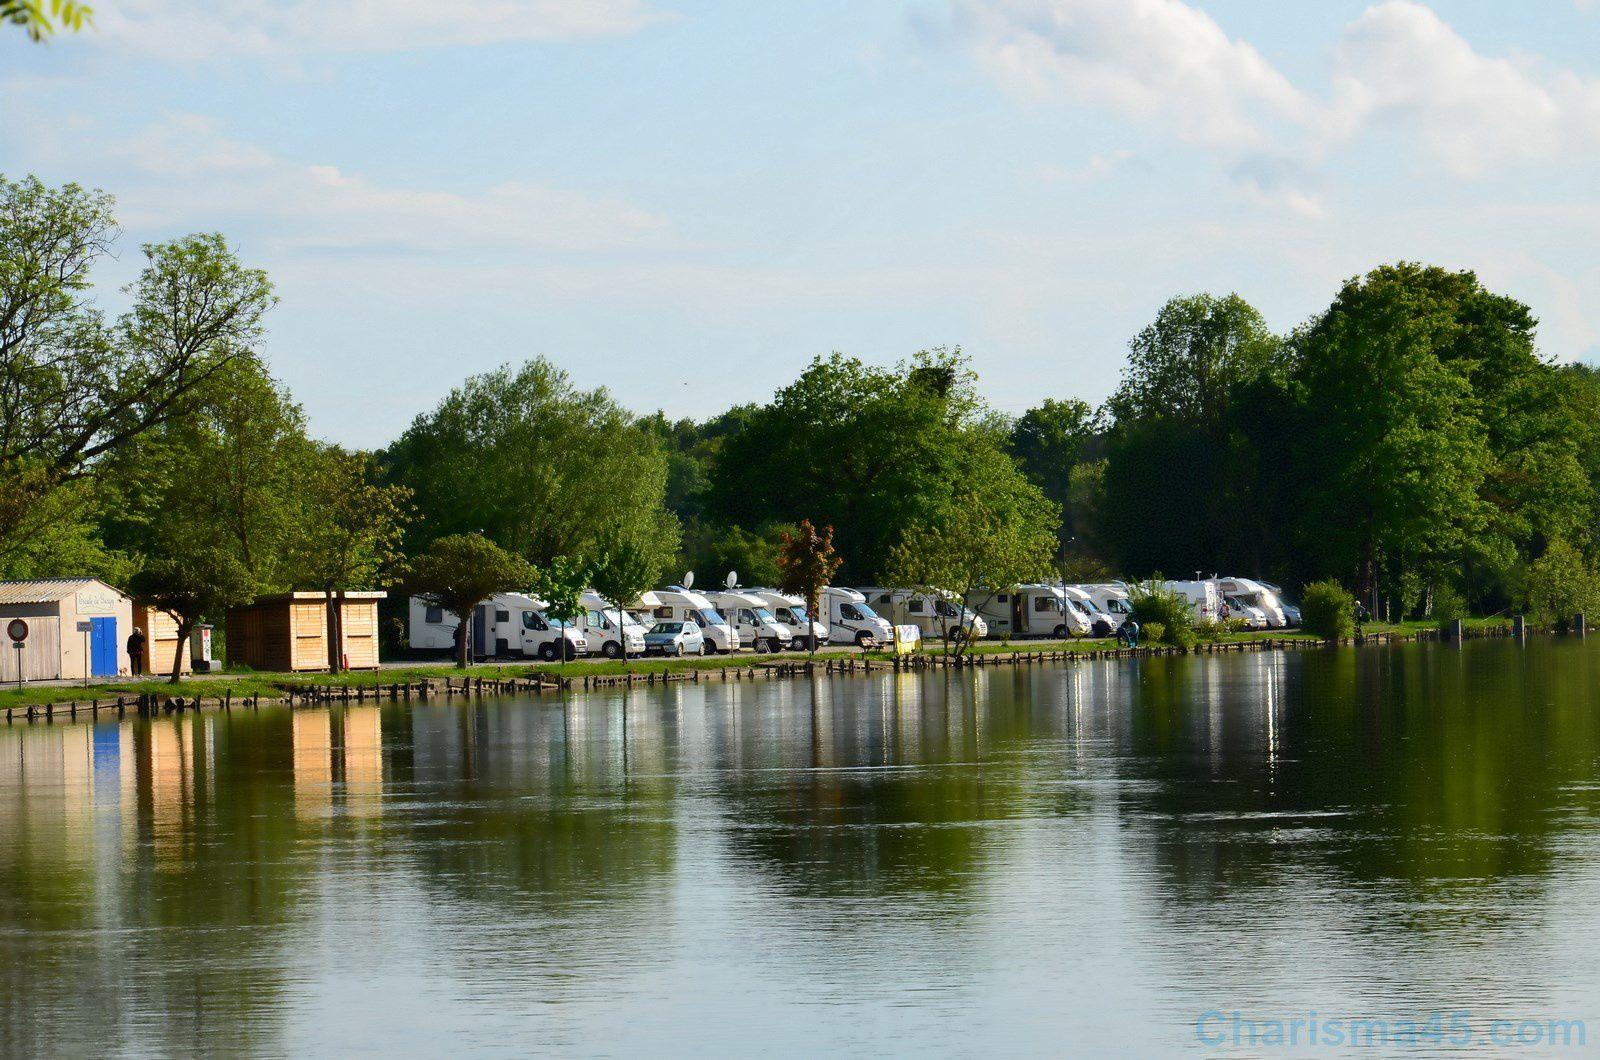 Gurgy (Voyages en camping-car)